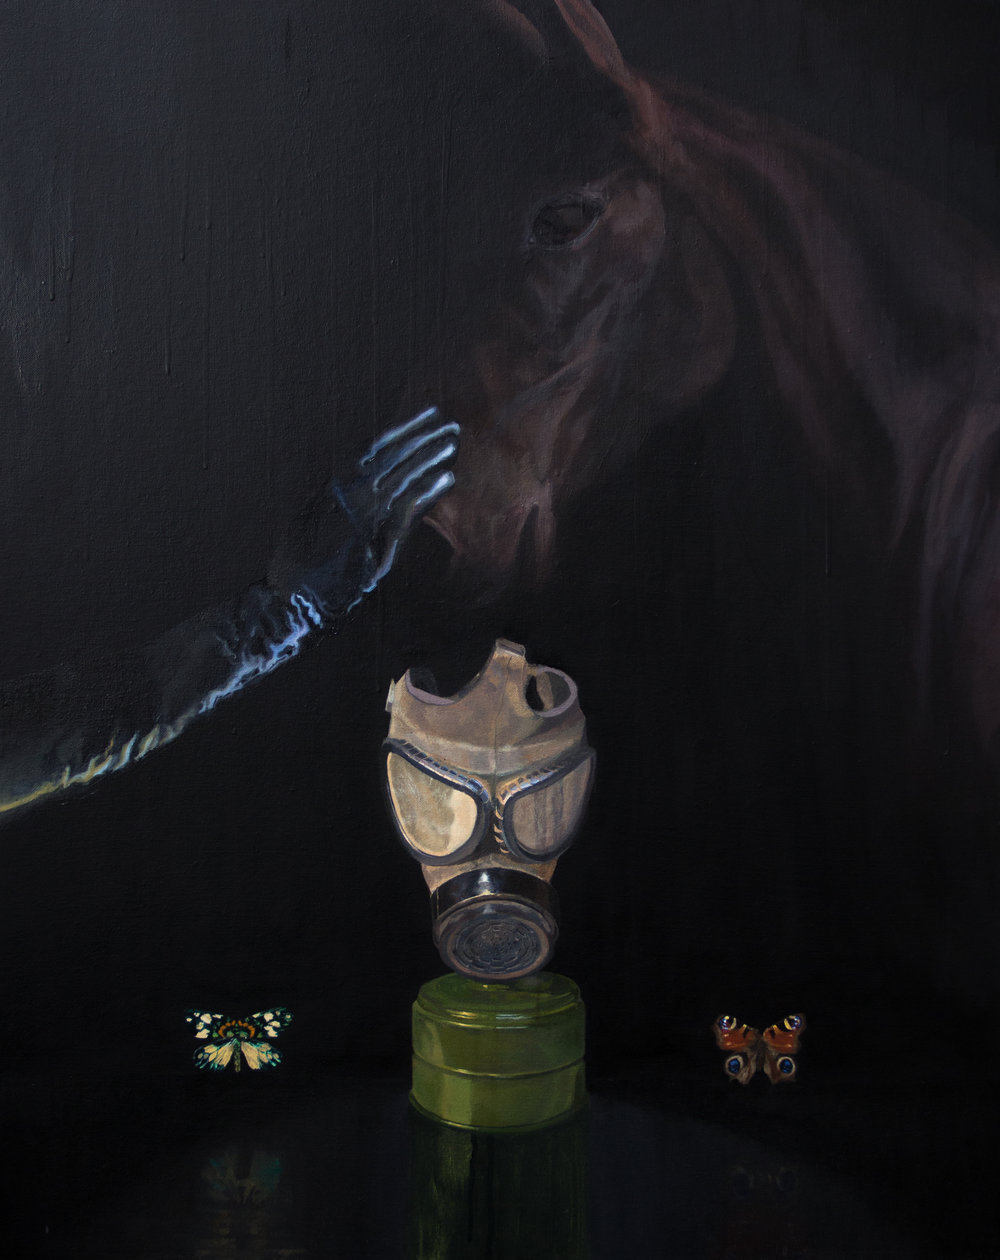 Nacho Vergara_Mask and buterflies_2018_81x62_Oil on canvas.jpg